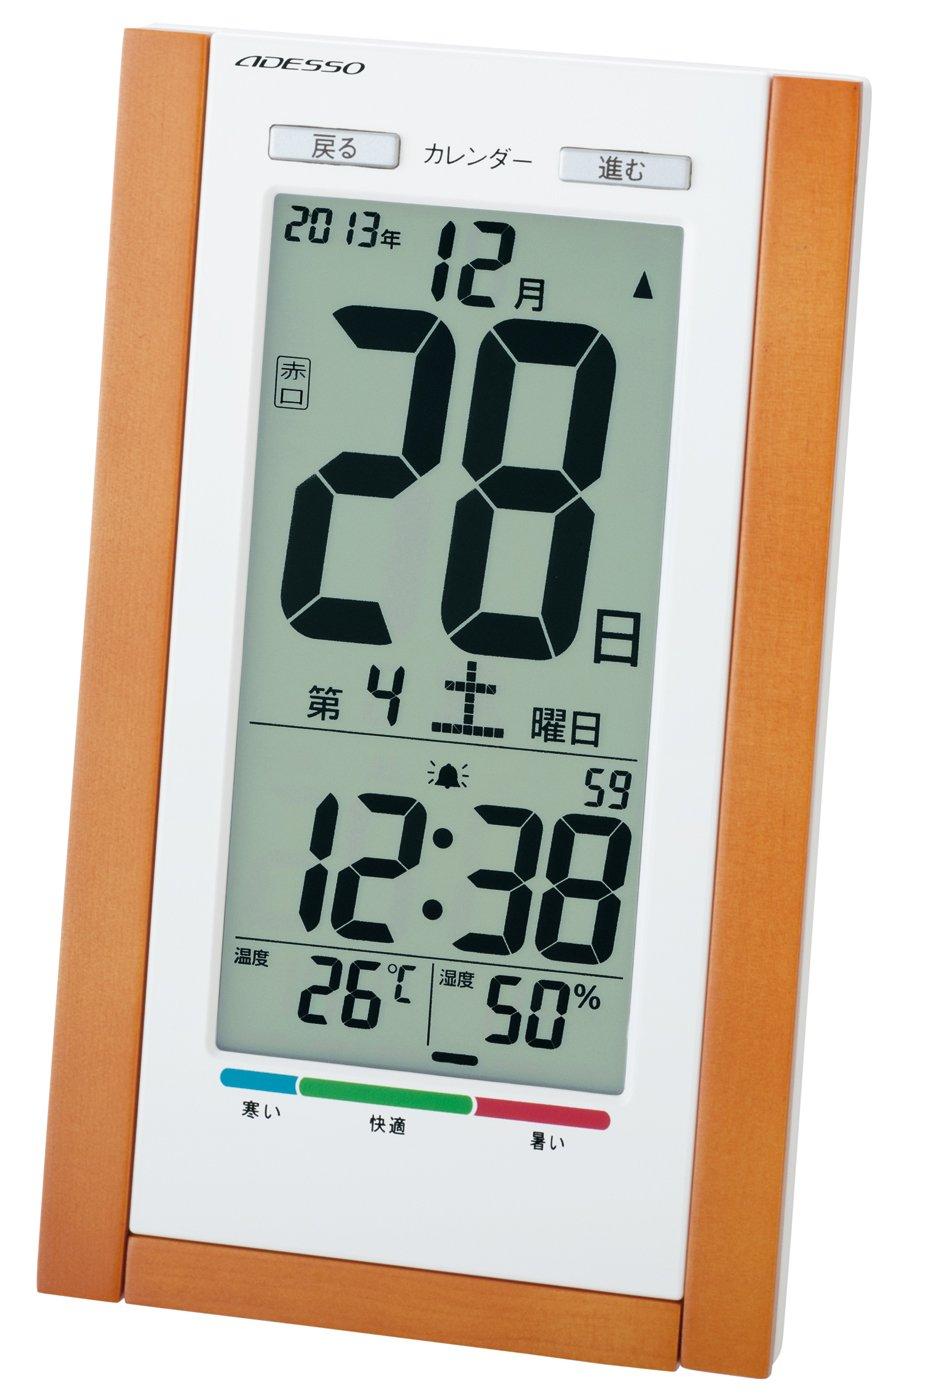 ADESSO(アデッソ) 電波デジタル目覚まし時計 日めくりカレンダー 六曜表示 温度湿度計付き 壁掛け時計兼用 ブラウン TSB-639 B00AF1PL1C